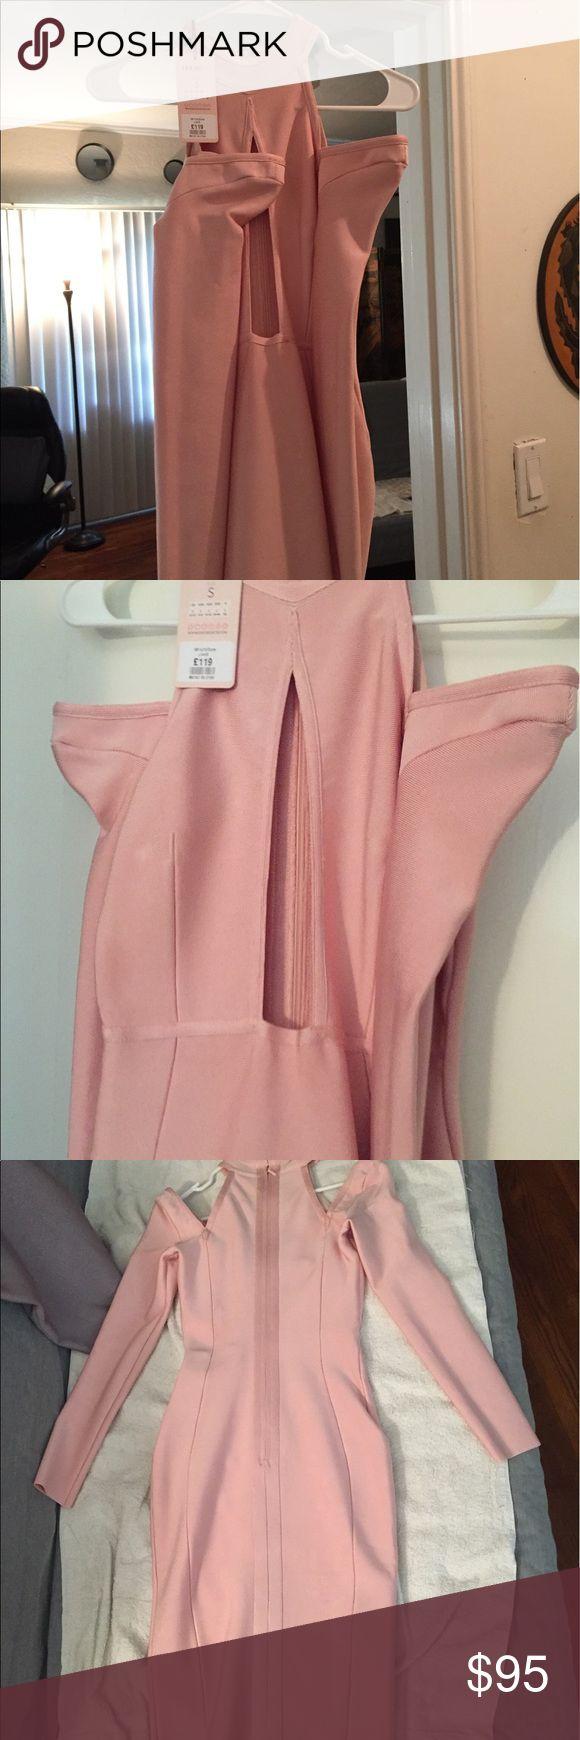 Pink Bandage Dress Pink bandage dress, Long sleeves,Hi neck, teaser front. House of CB Dresses Long Sleeve